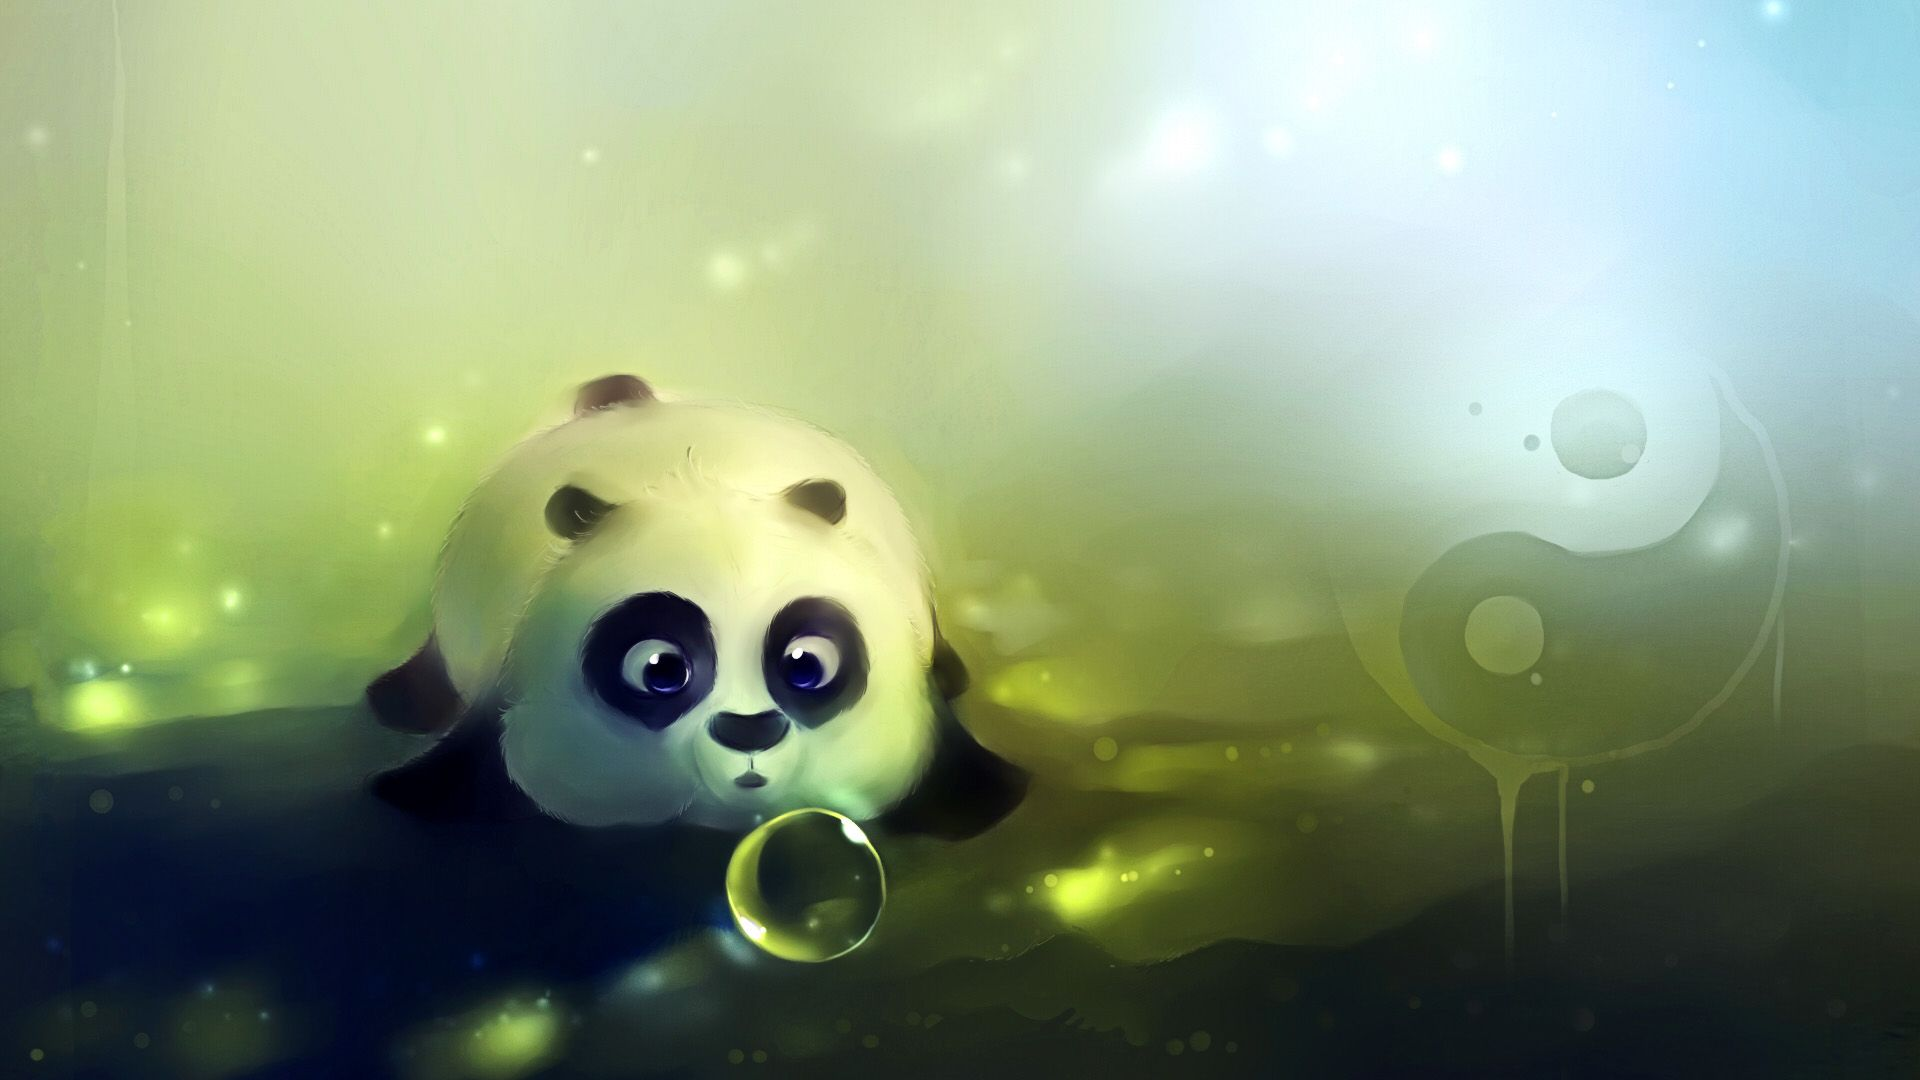 Cute Anime Panda Wallpapers On Wallpaperdog